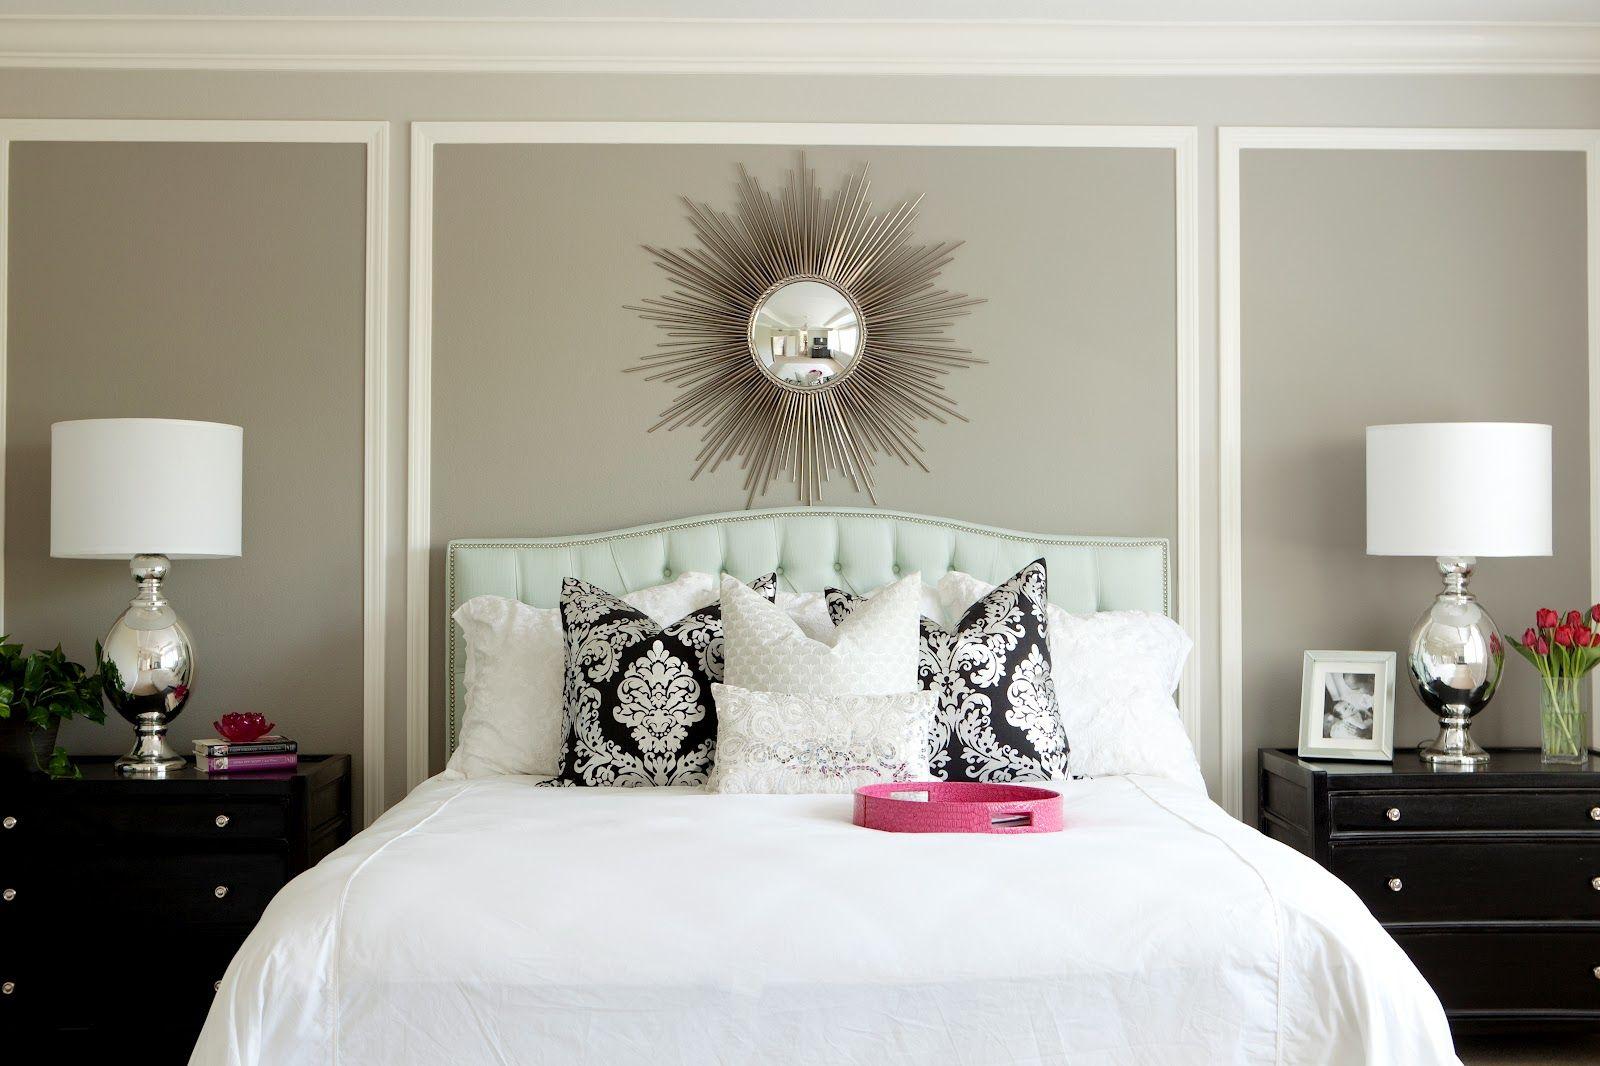 Master bedroom green paint ideas  IMGJPG   Things I love  Pinterest  Relaxing